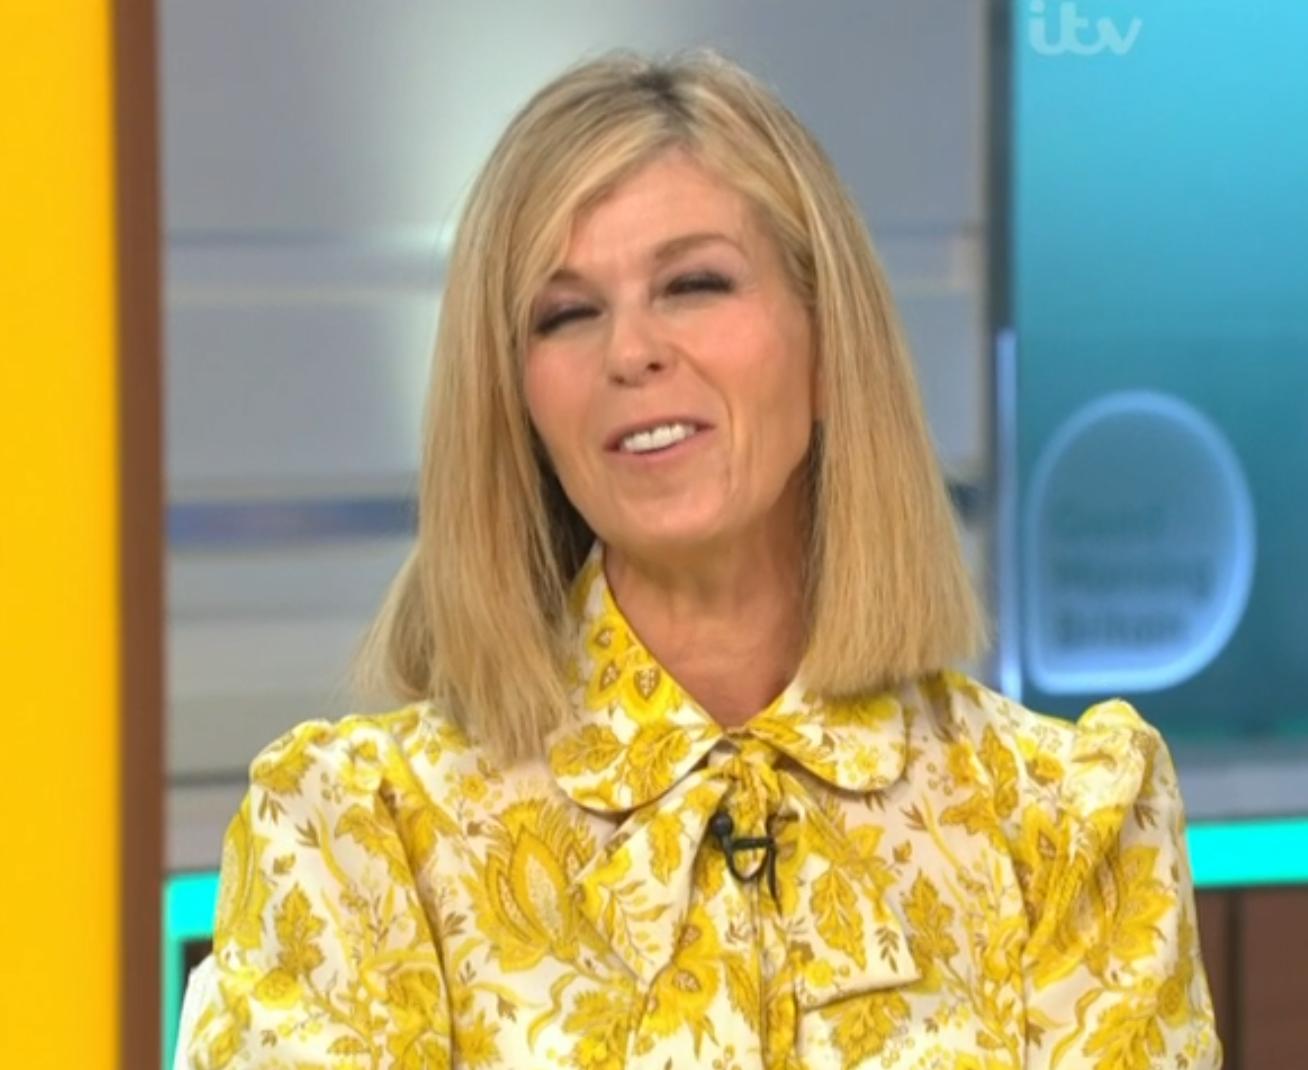 Kate Garraway GMB (Credit: ITV)